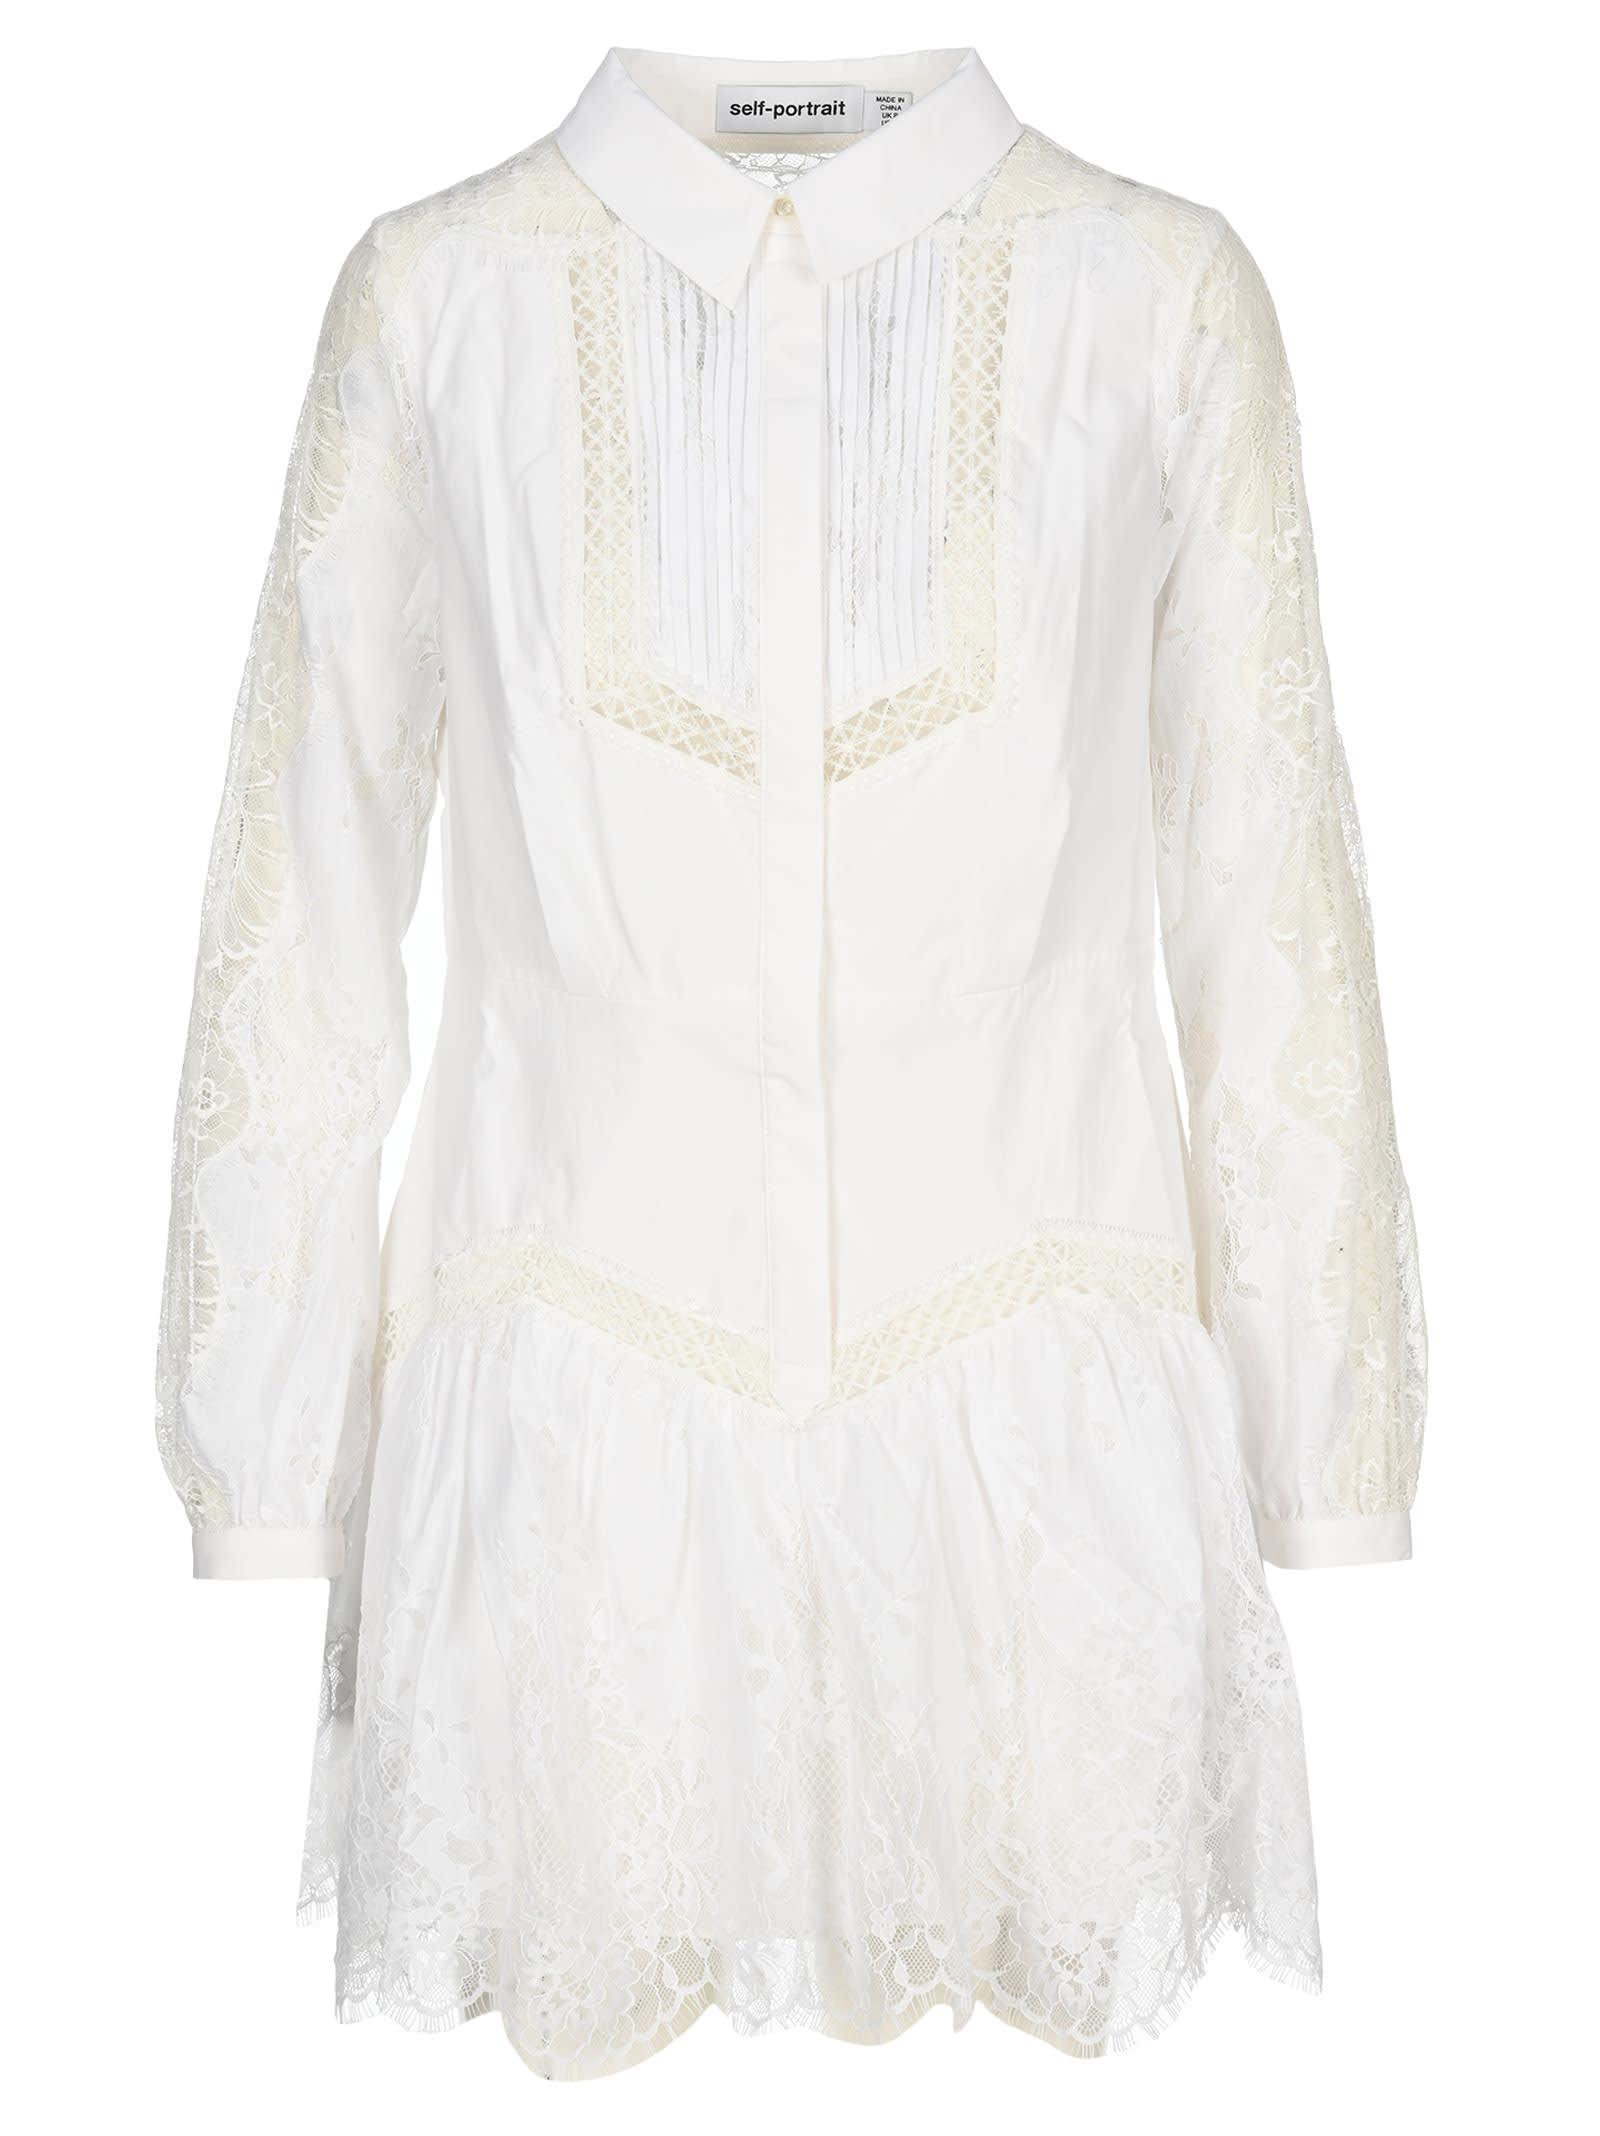 Buy Self Portrait Lace Panel Shirt Dress online, shop self-portrait with free shipping